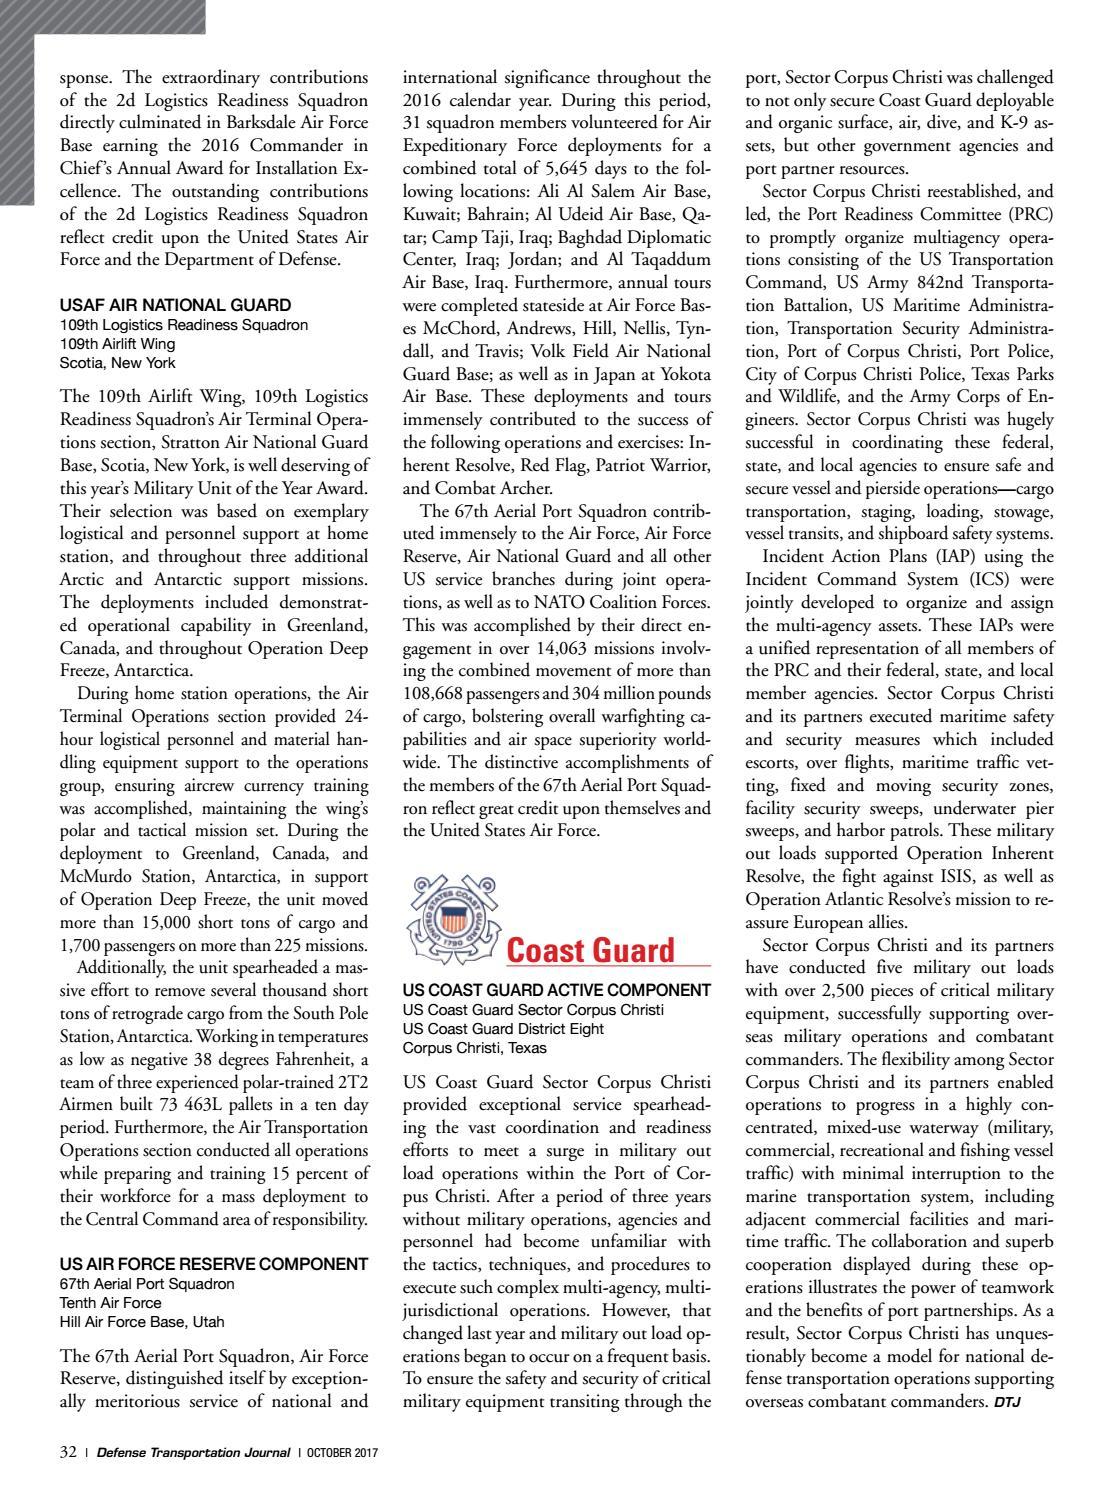 Defense Transportation Journal